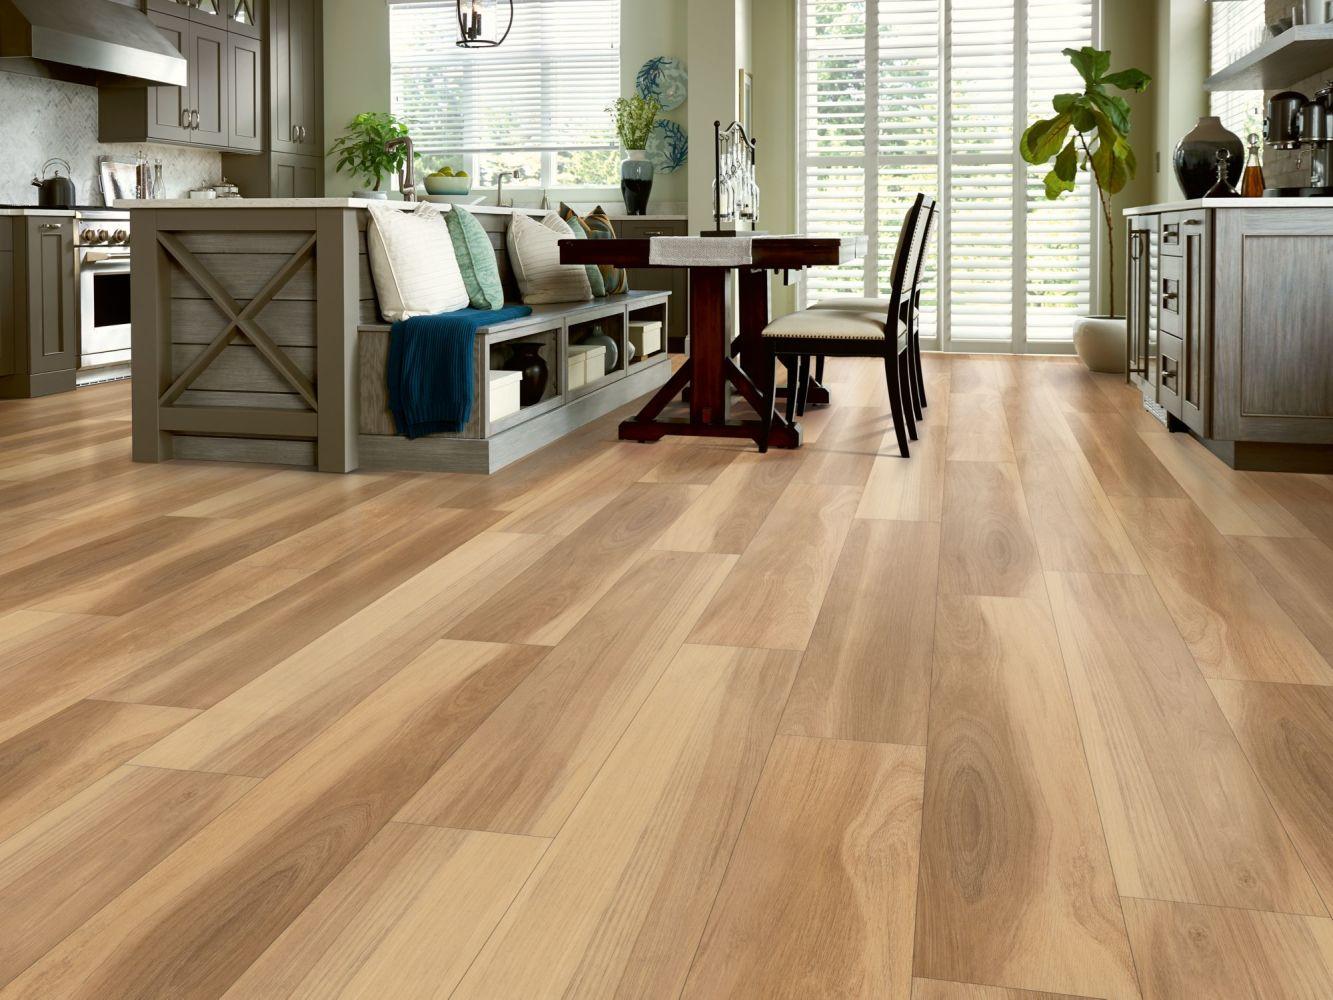 Shaw Floors Resilient Residential Cathedral Oak 720c Plus Khaki Oak 00699_0866V